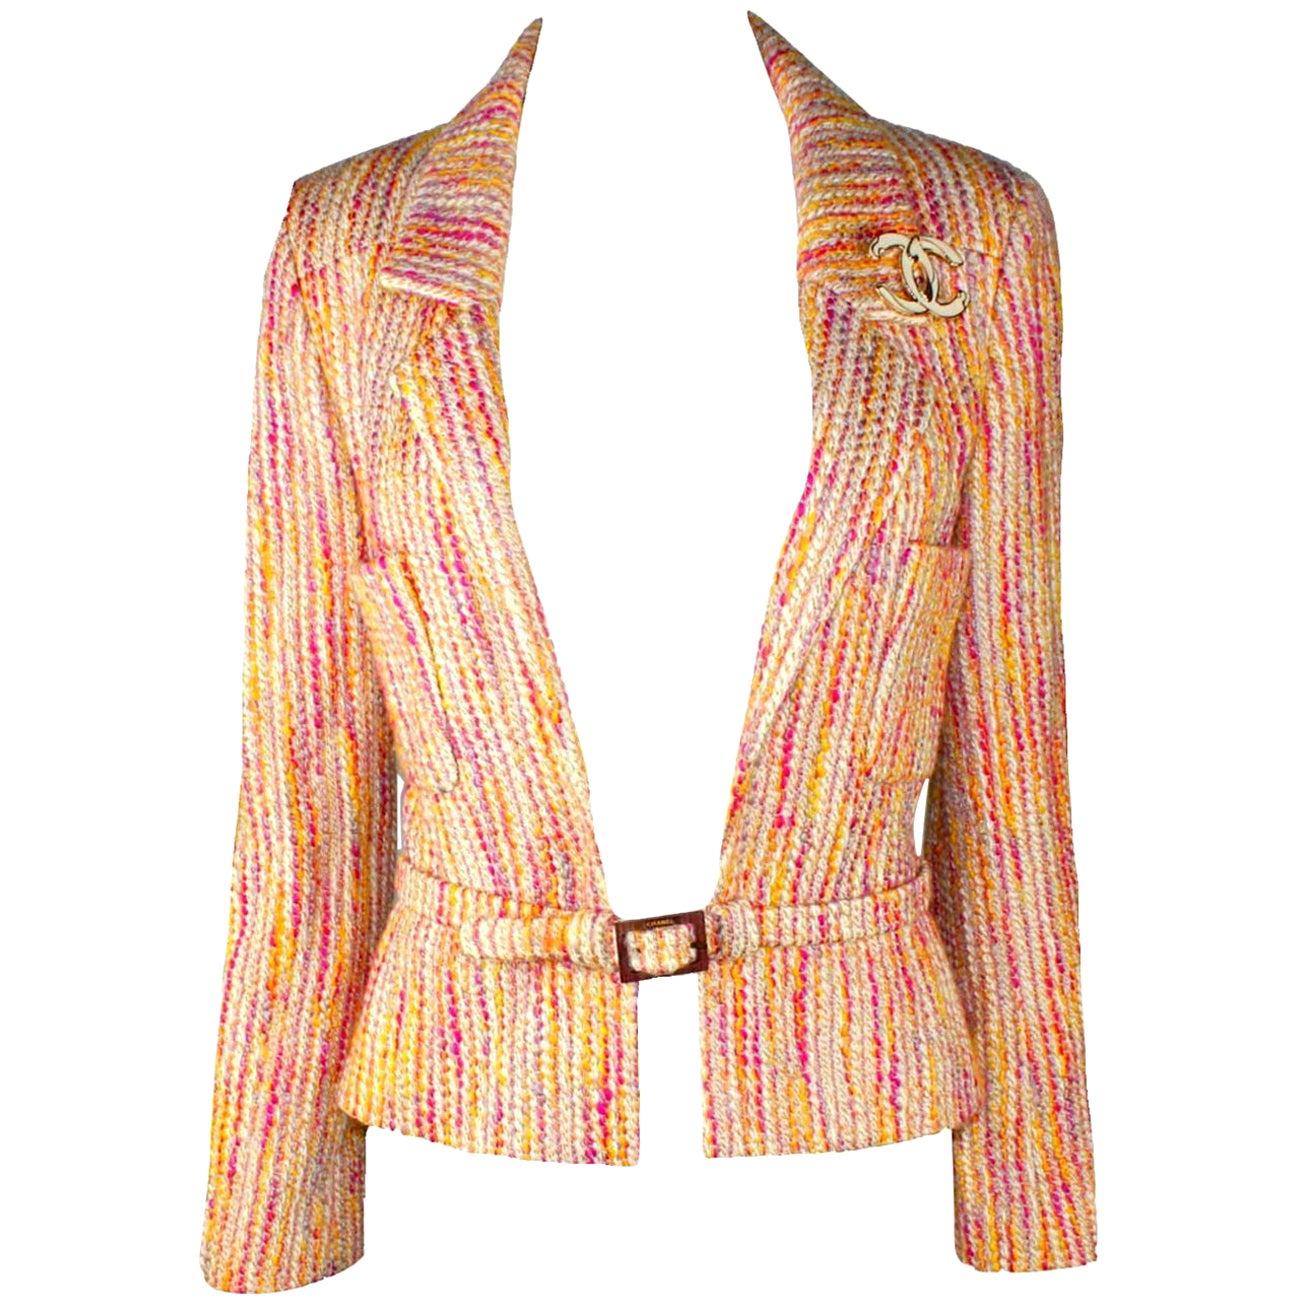 NEW Multicolored Chanel Lesage Fantasy Tweed Jacket Blazer with Belt